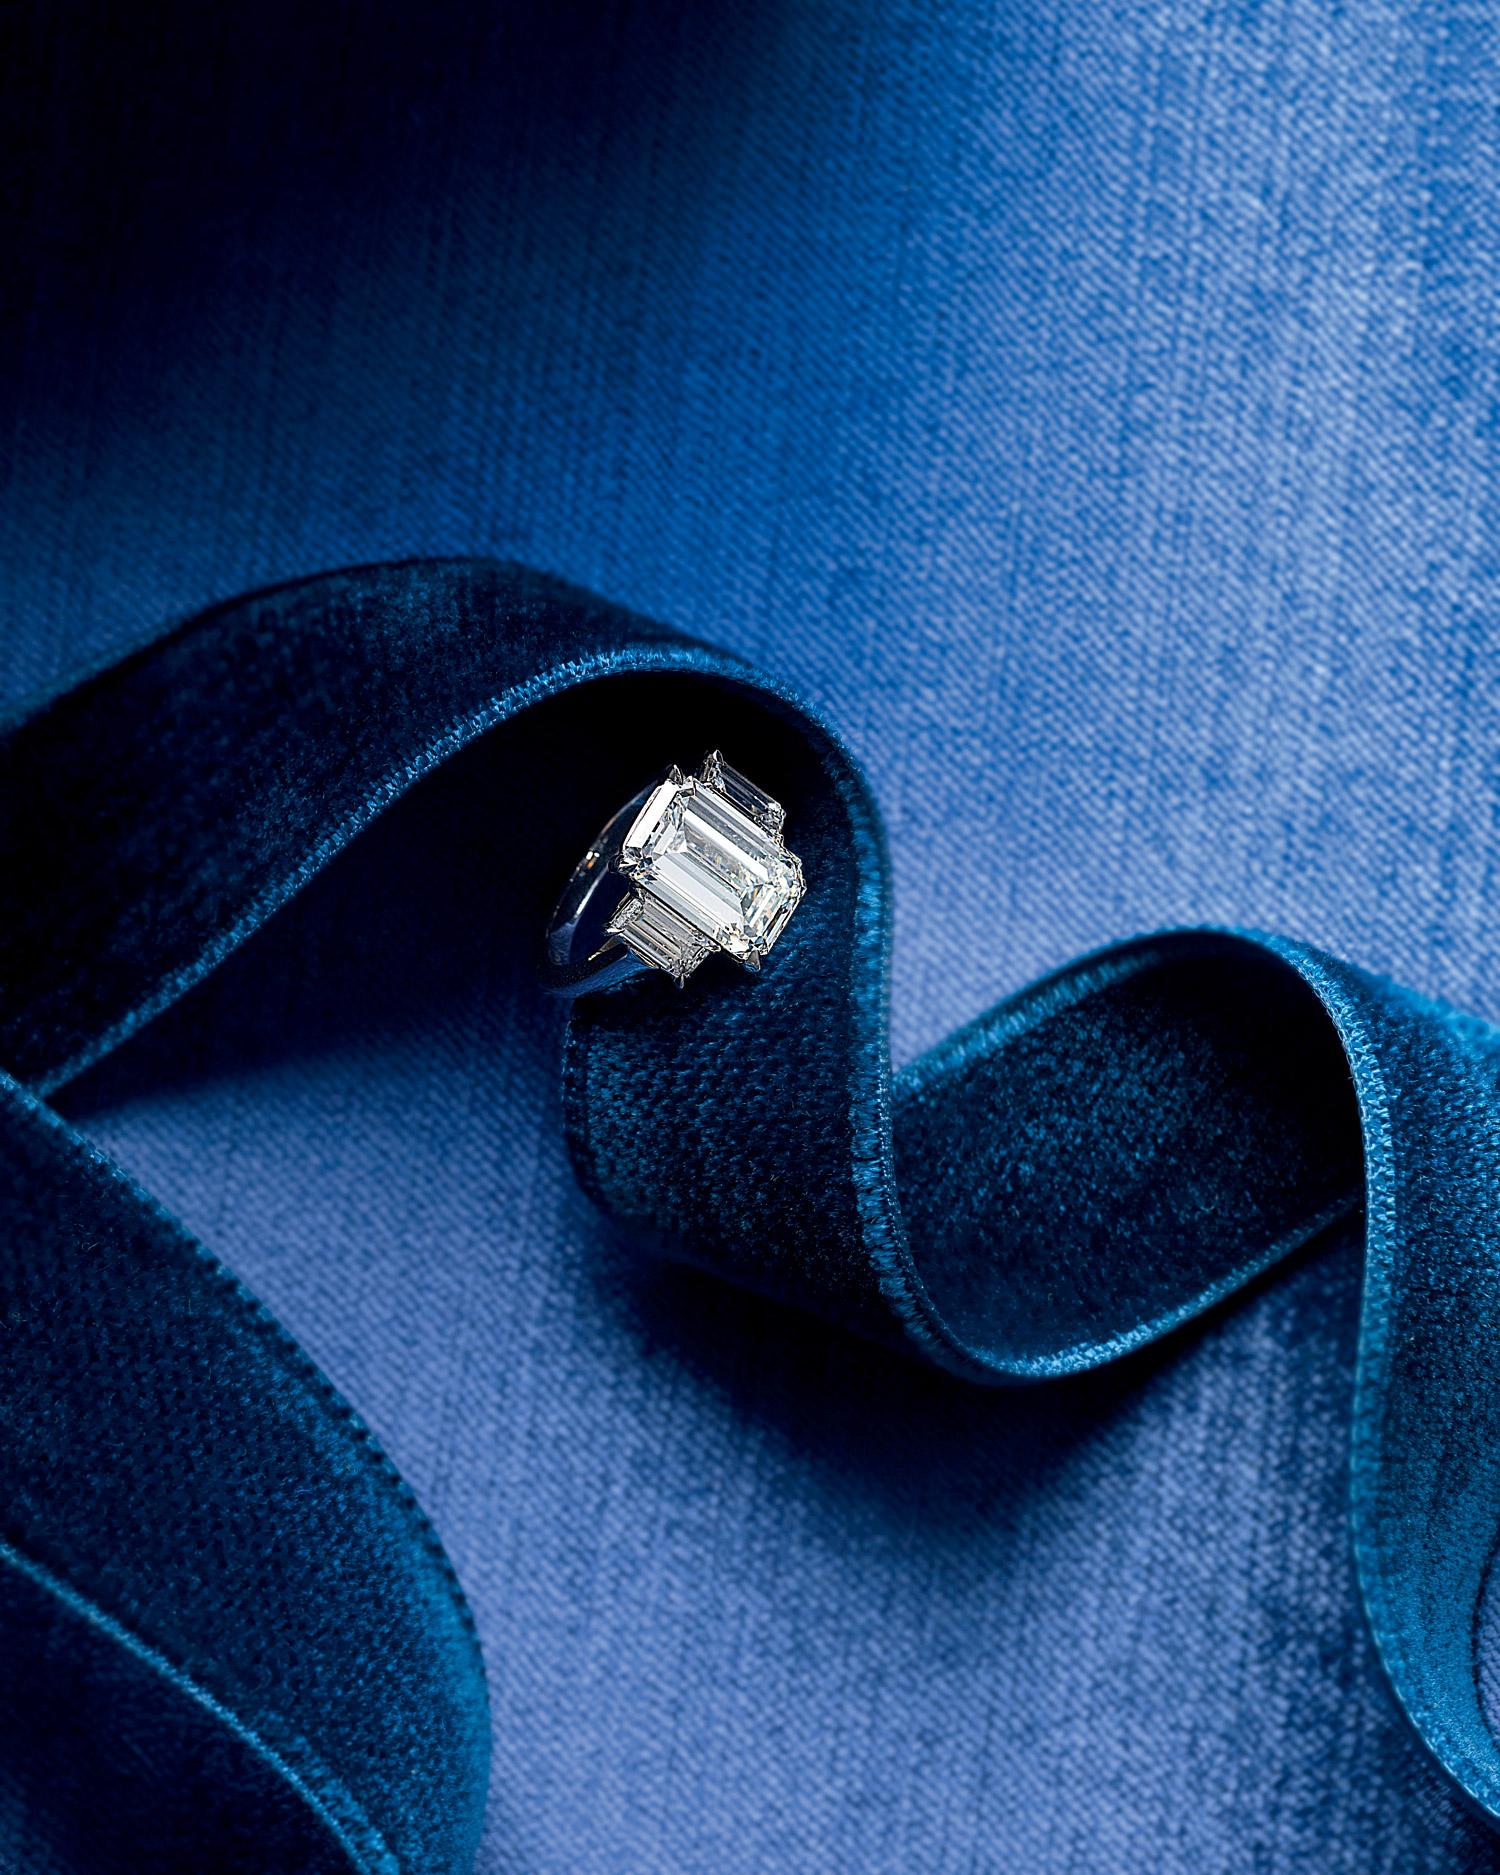 rings-dimonds-mwd107940.jpg